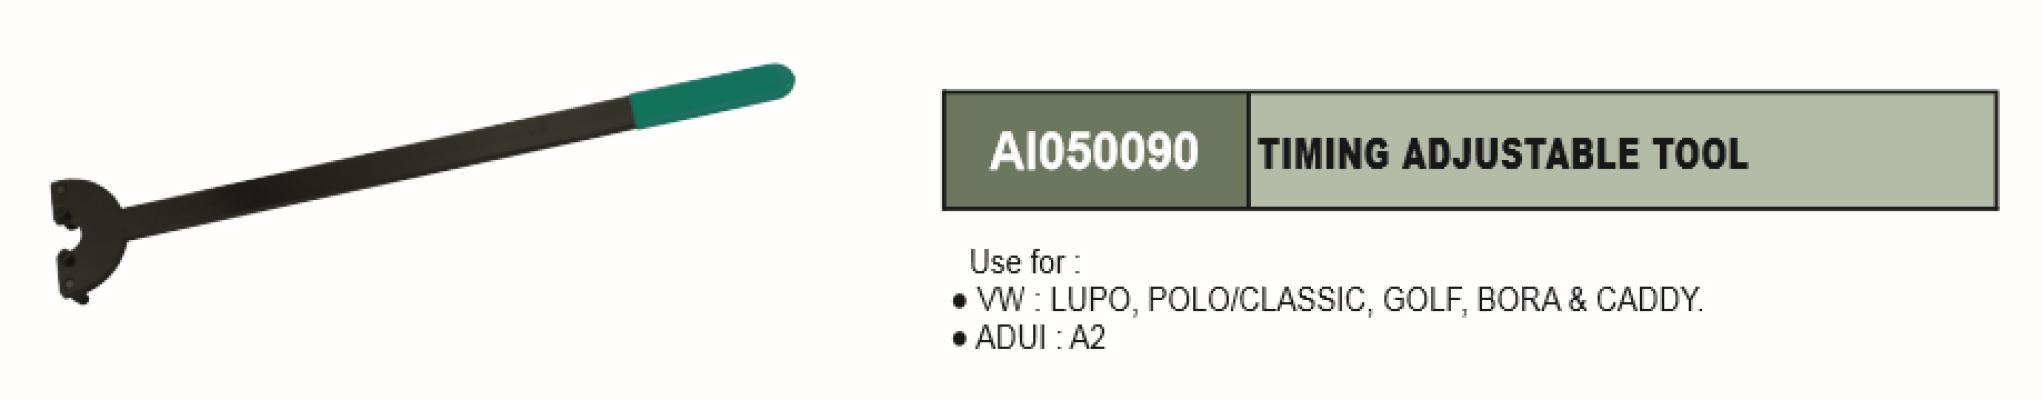 TIMING ADJUSTABLE TOOL - AI050090